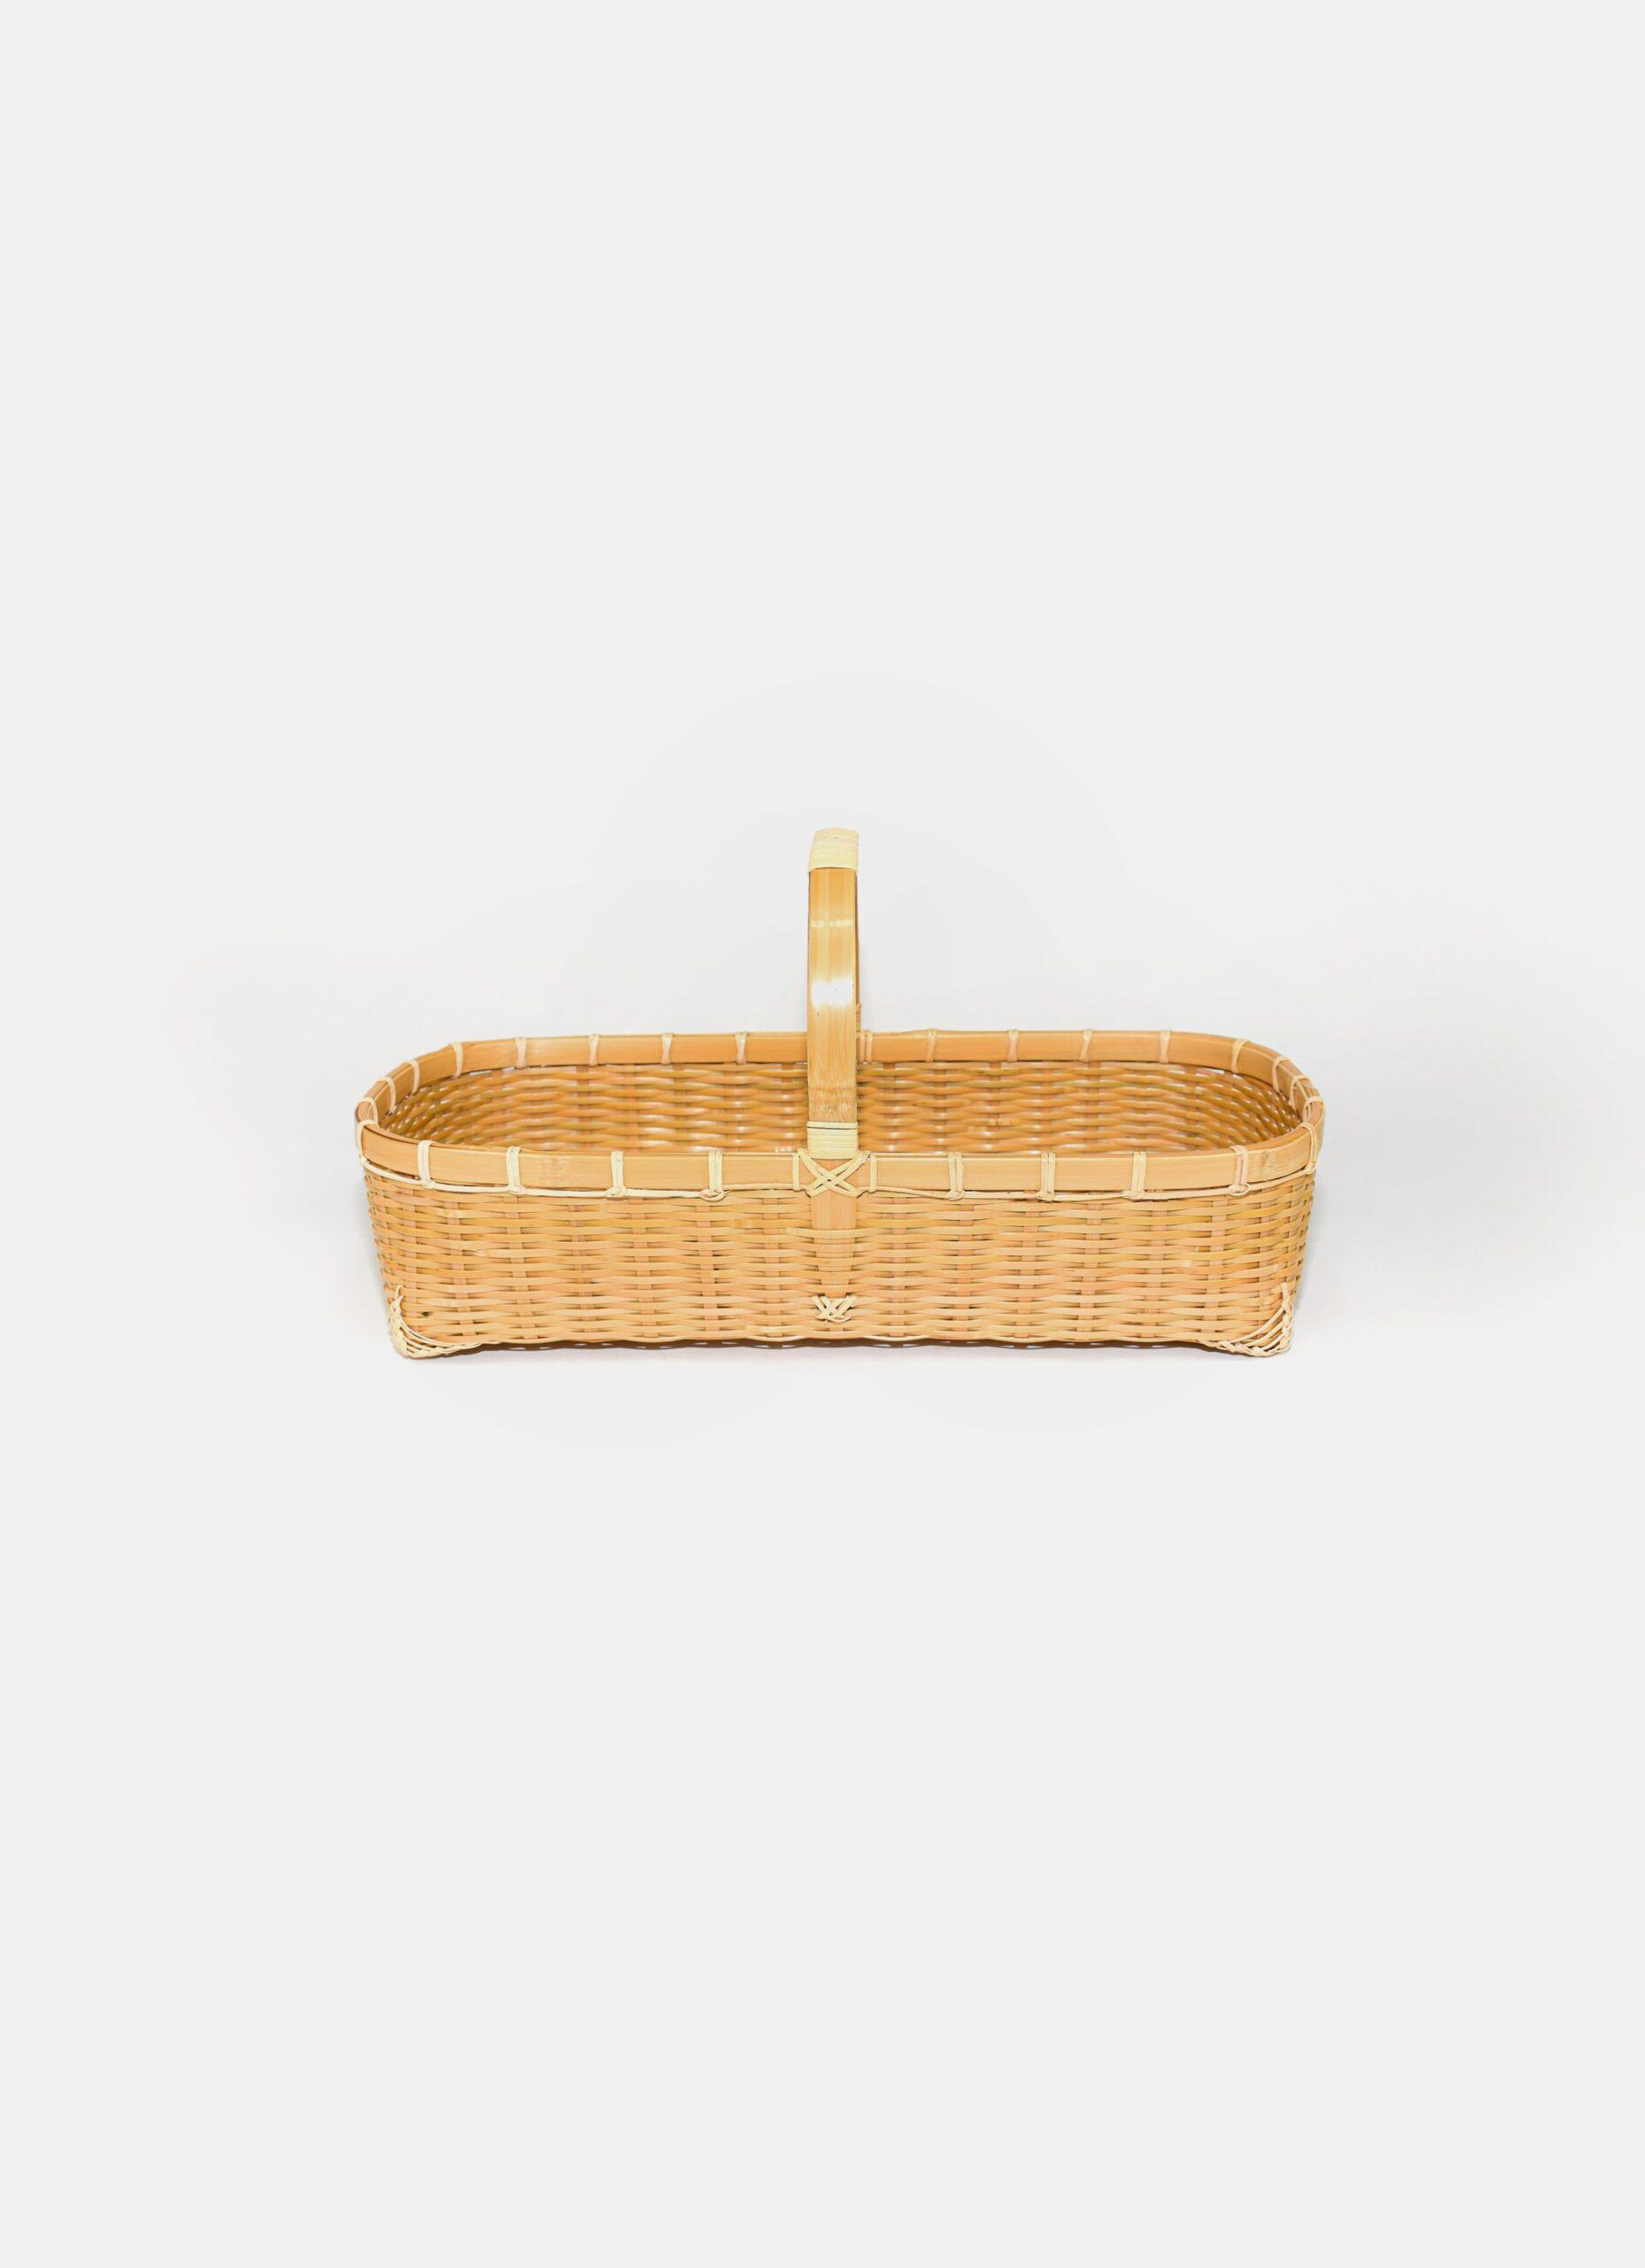 Kohchosai Kosuga - Handmade Japanese Bamboo Bread Basket